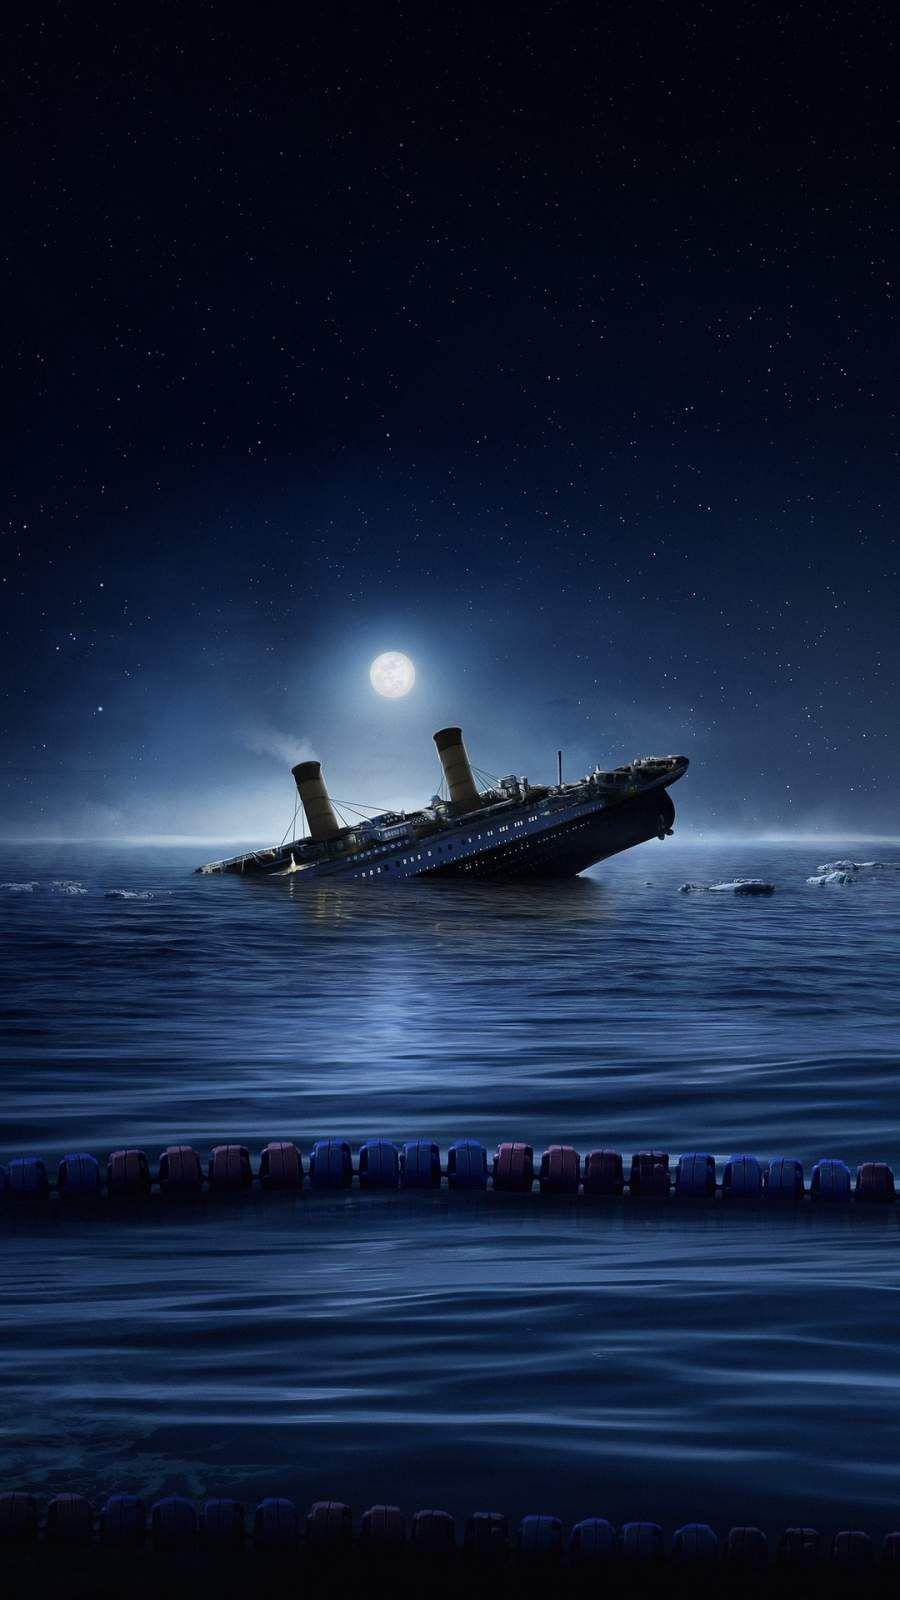 Titanic Ship Iphone Wallpaper Titanic Ship Iphone Wallpaper